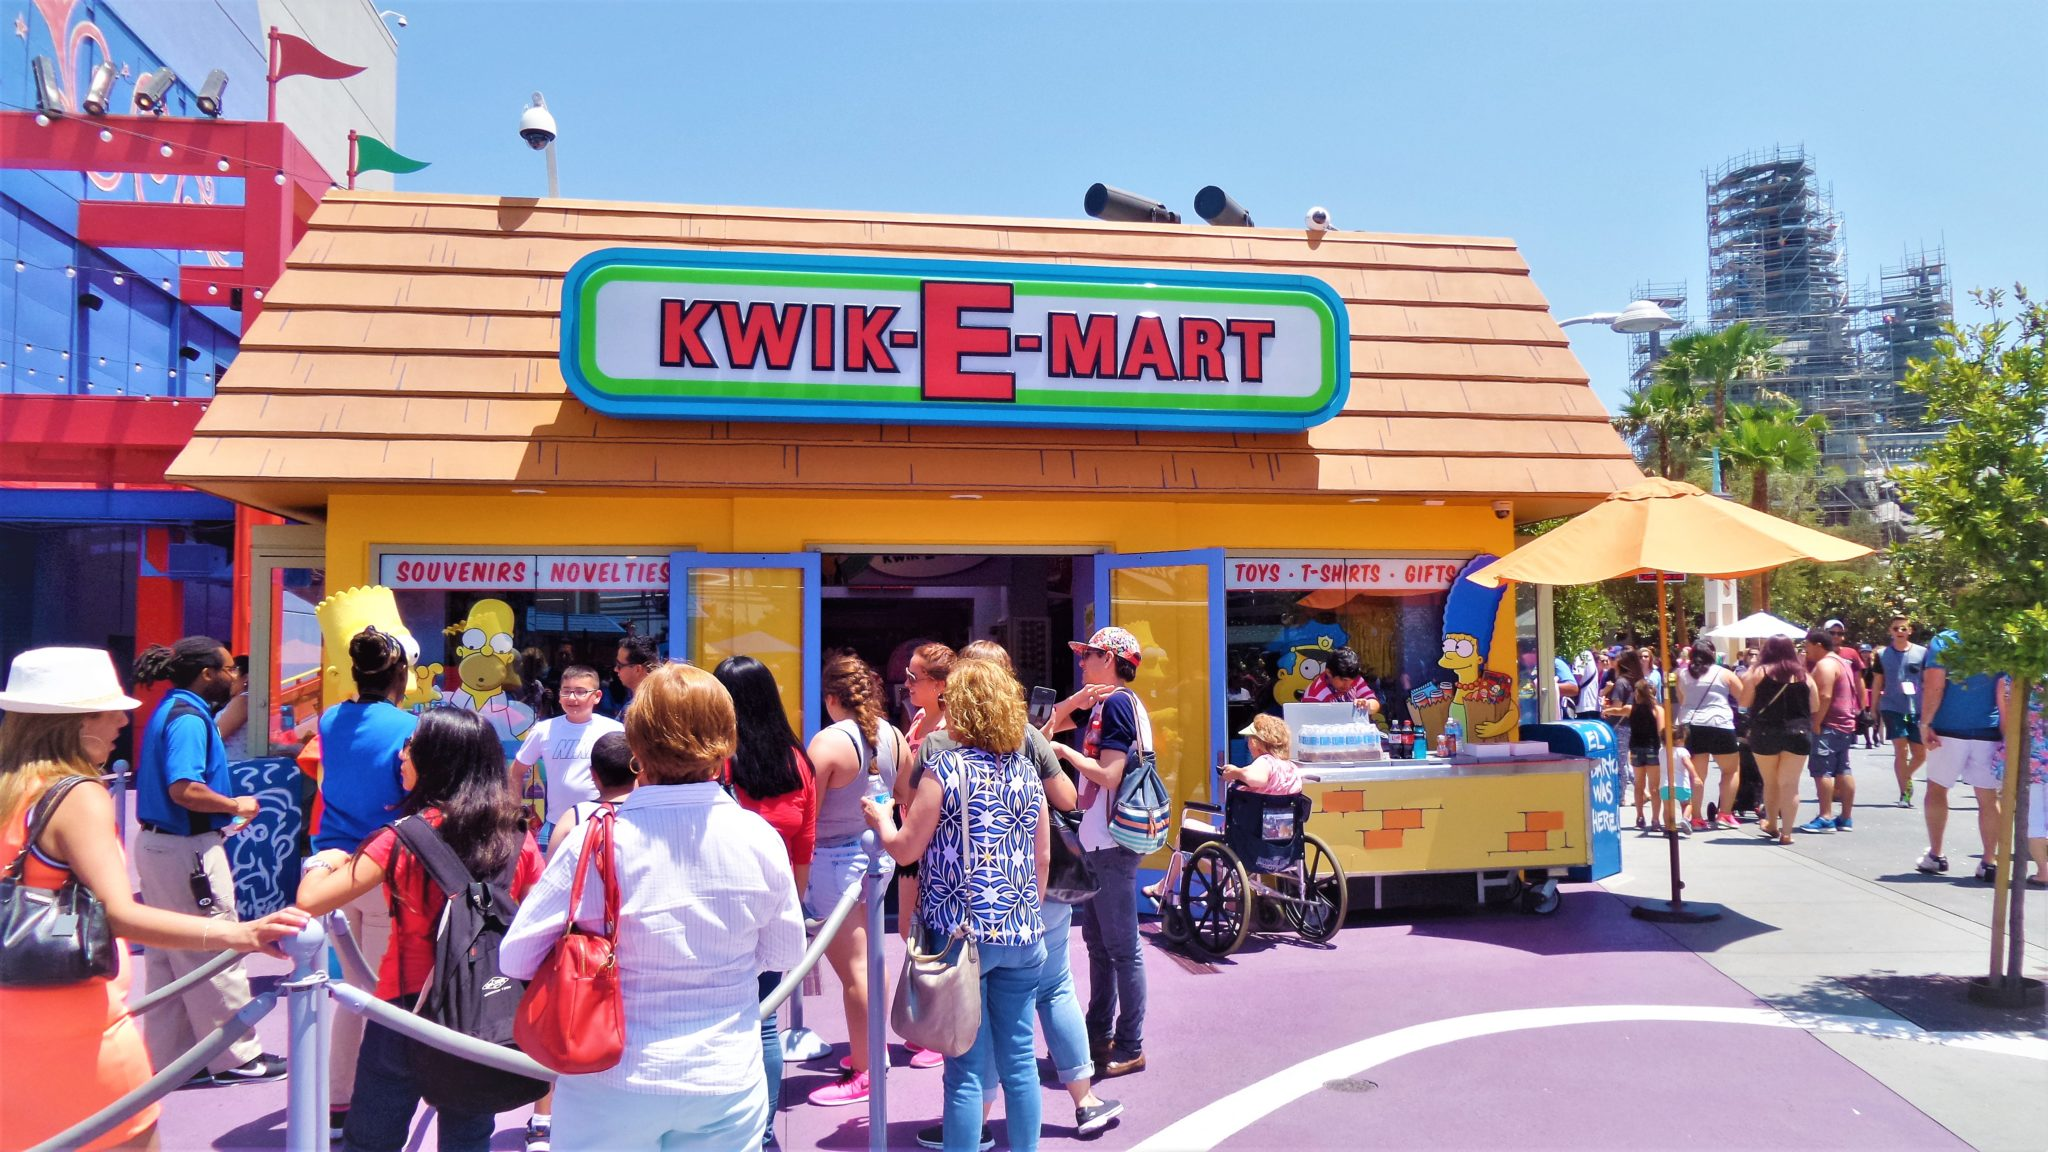 Kwik E Mart, springfield simpsons Universal Studios Hollywood